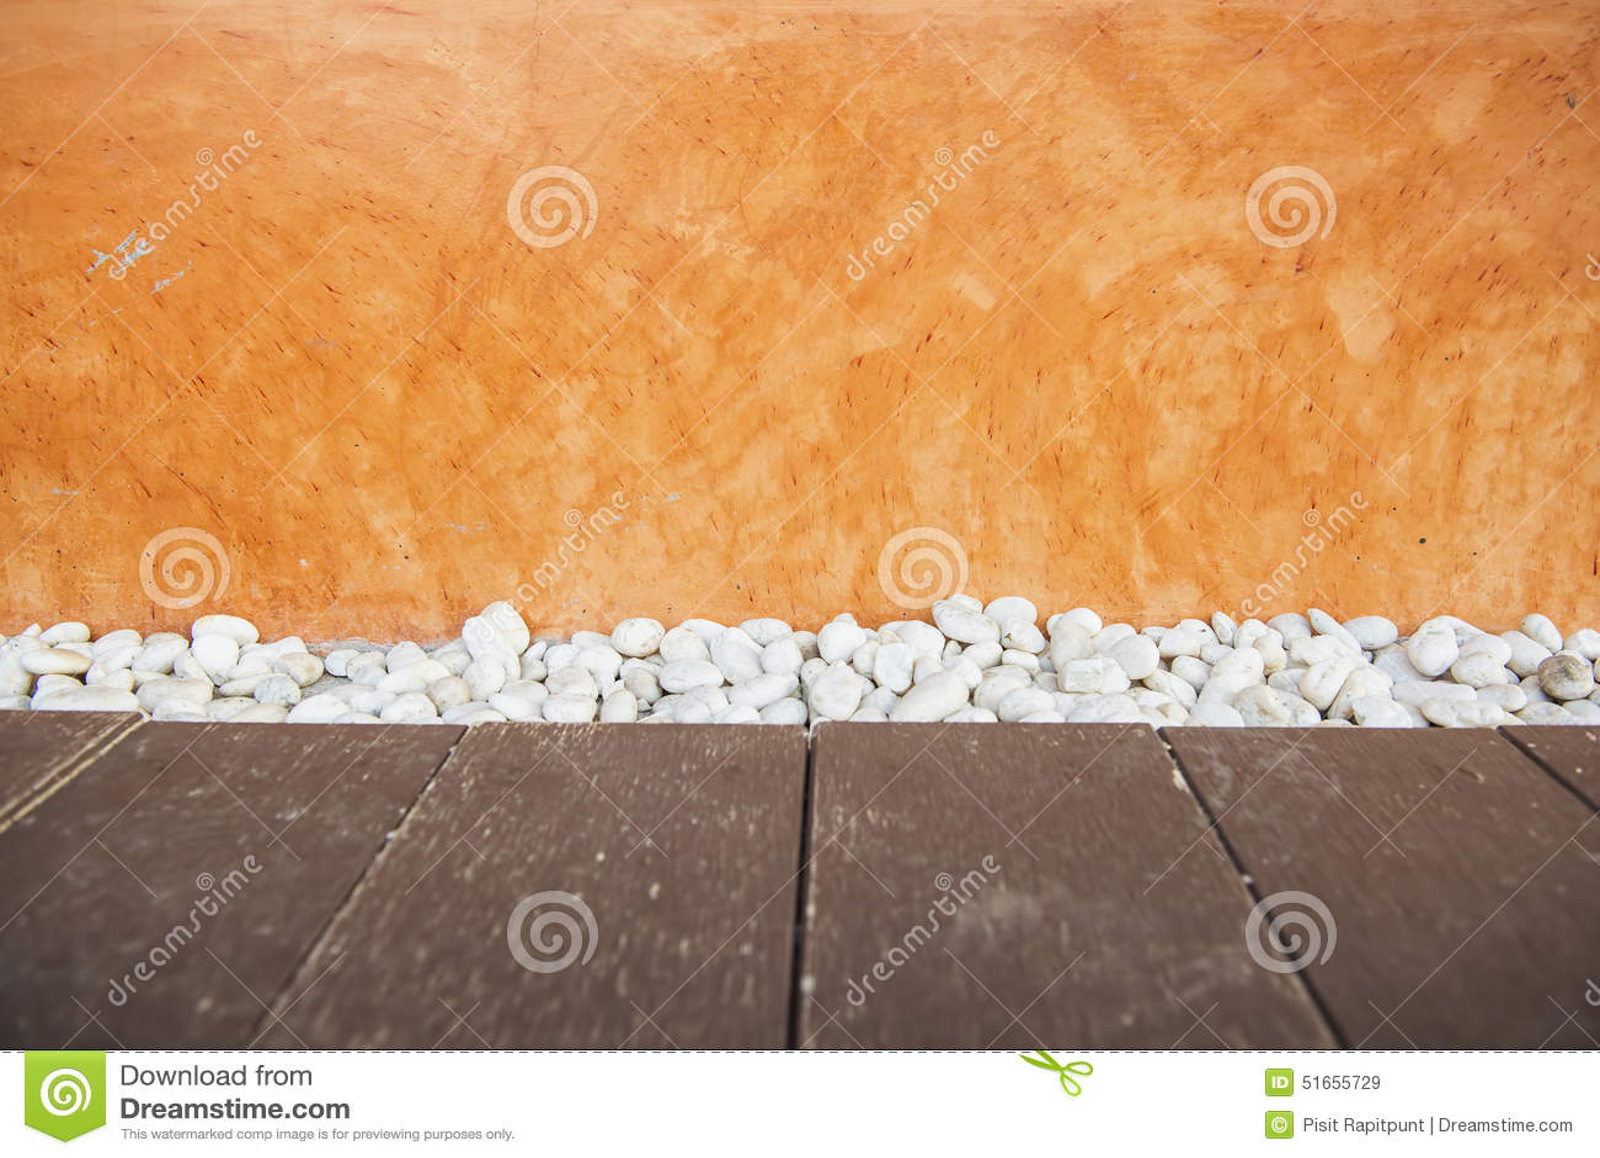 Orange Cement Wall : Orange grunge concrete wall textured and background stock